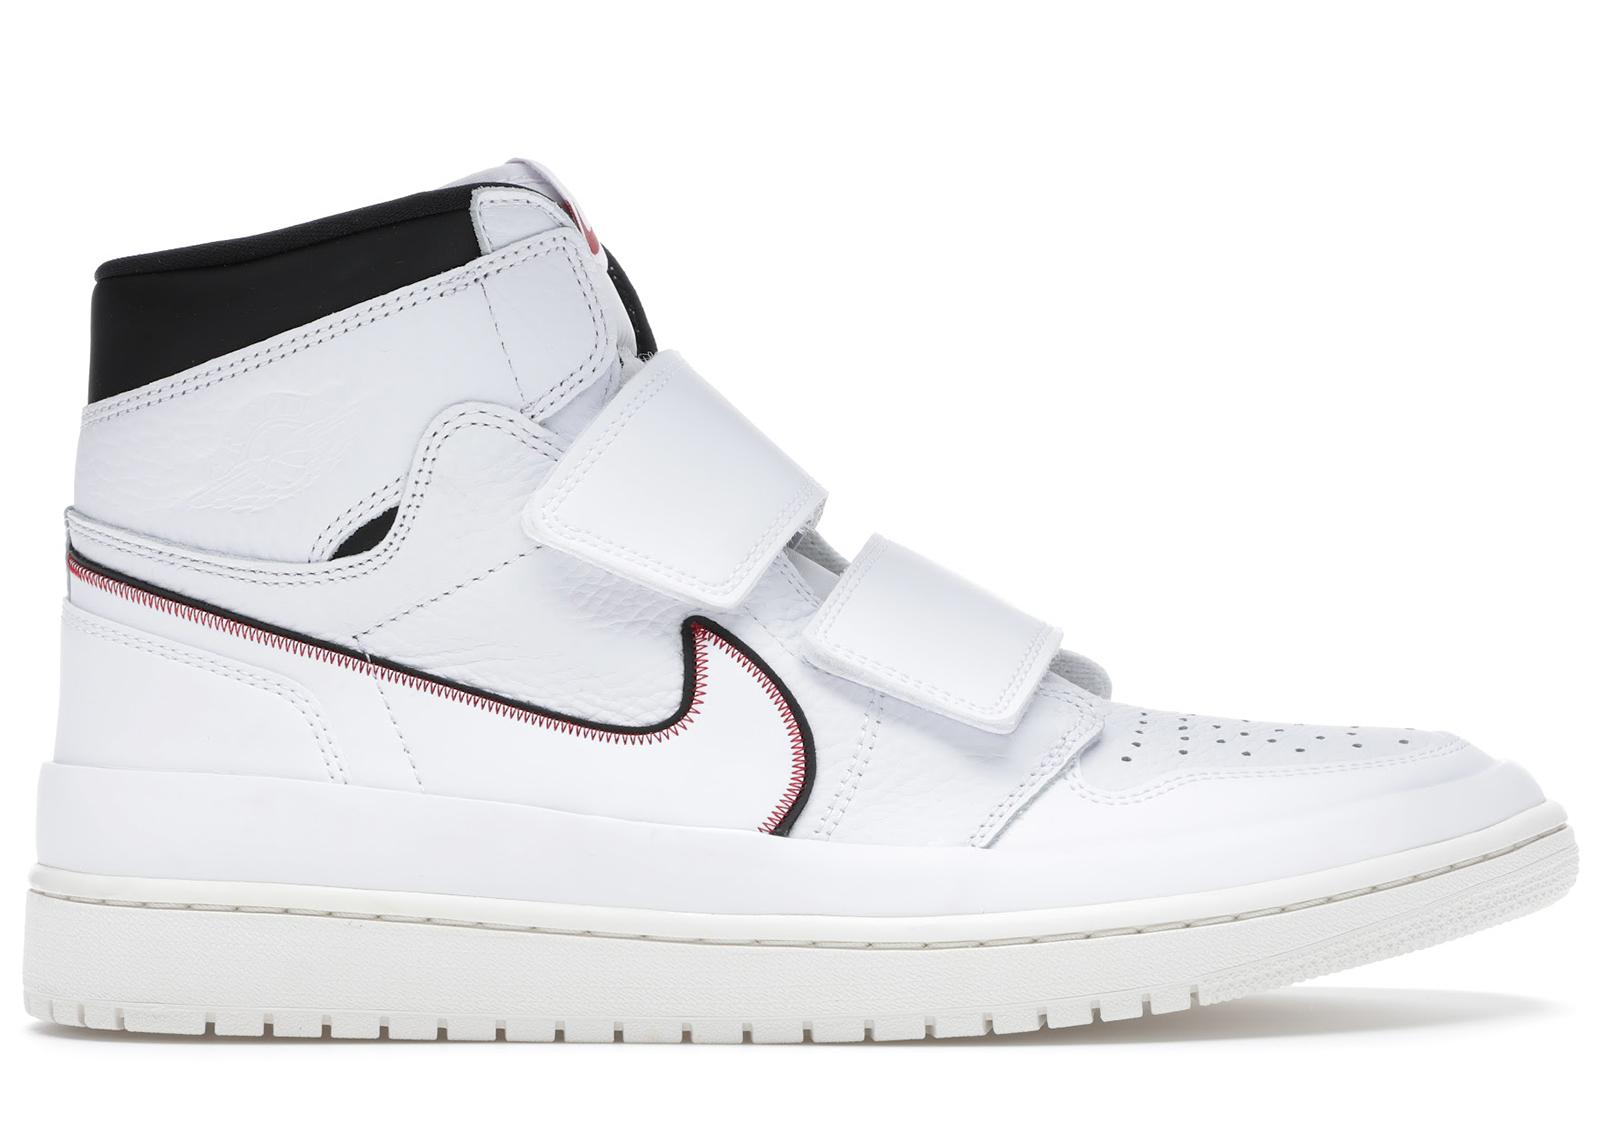 Jordan 1 Retro High Double Strap White